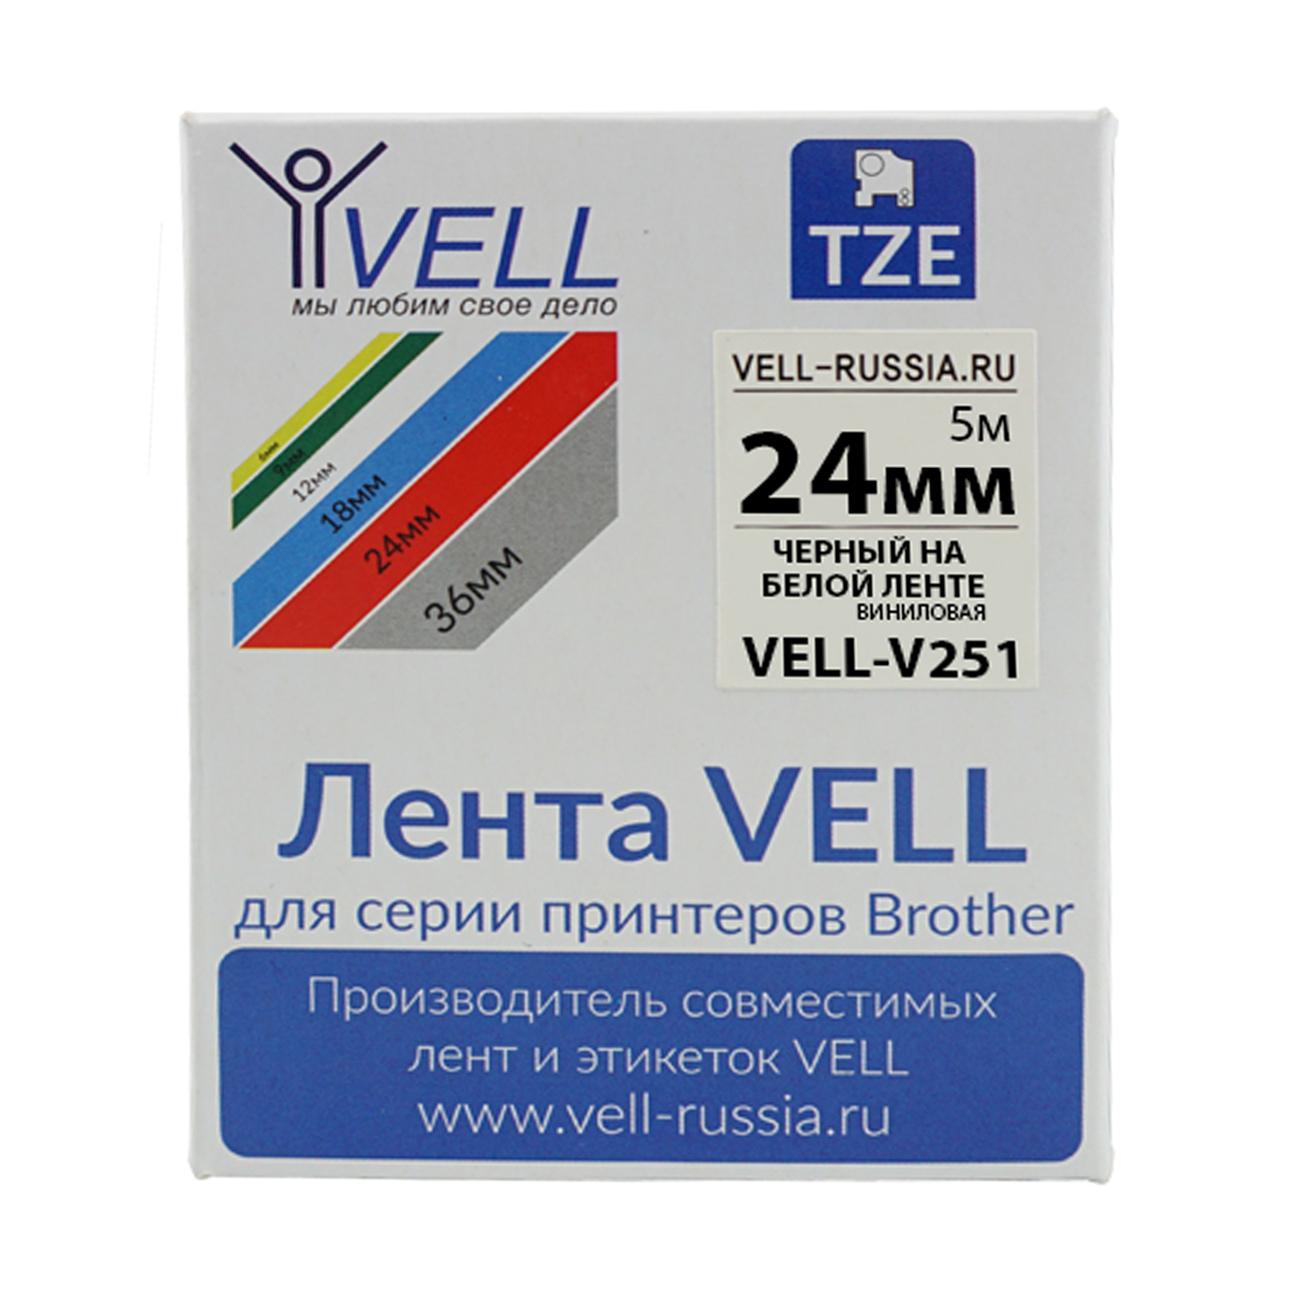 Фото Лента виниловая Vell V-251 (24 мм, черный на белом) для PT D600/2700/P700/P750/ PTE550/9700/P900 {Vell-V251}